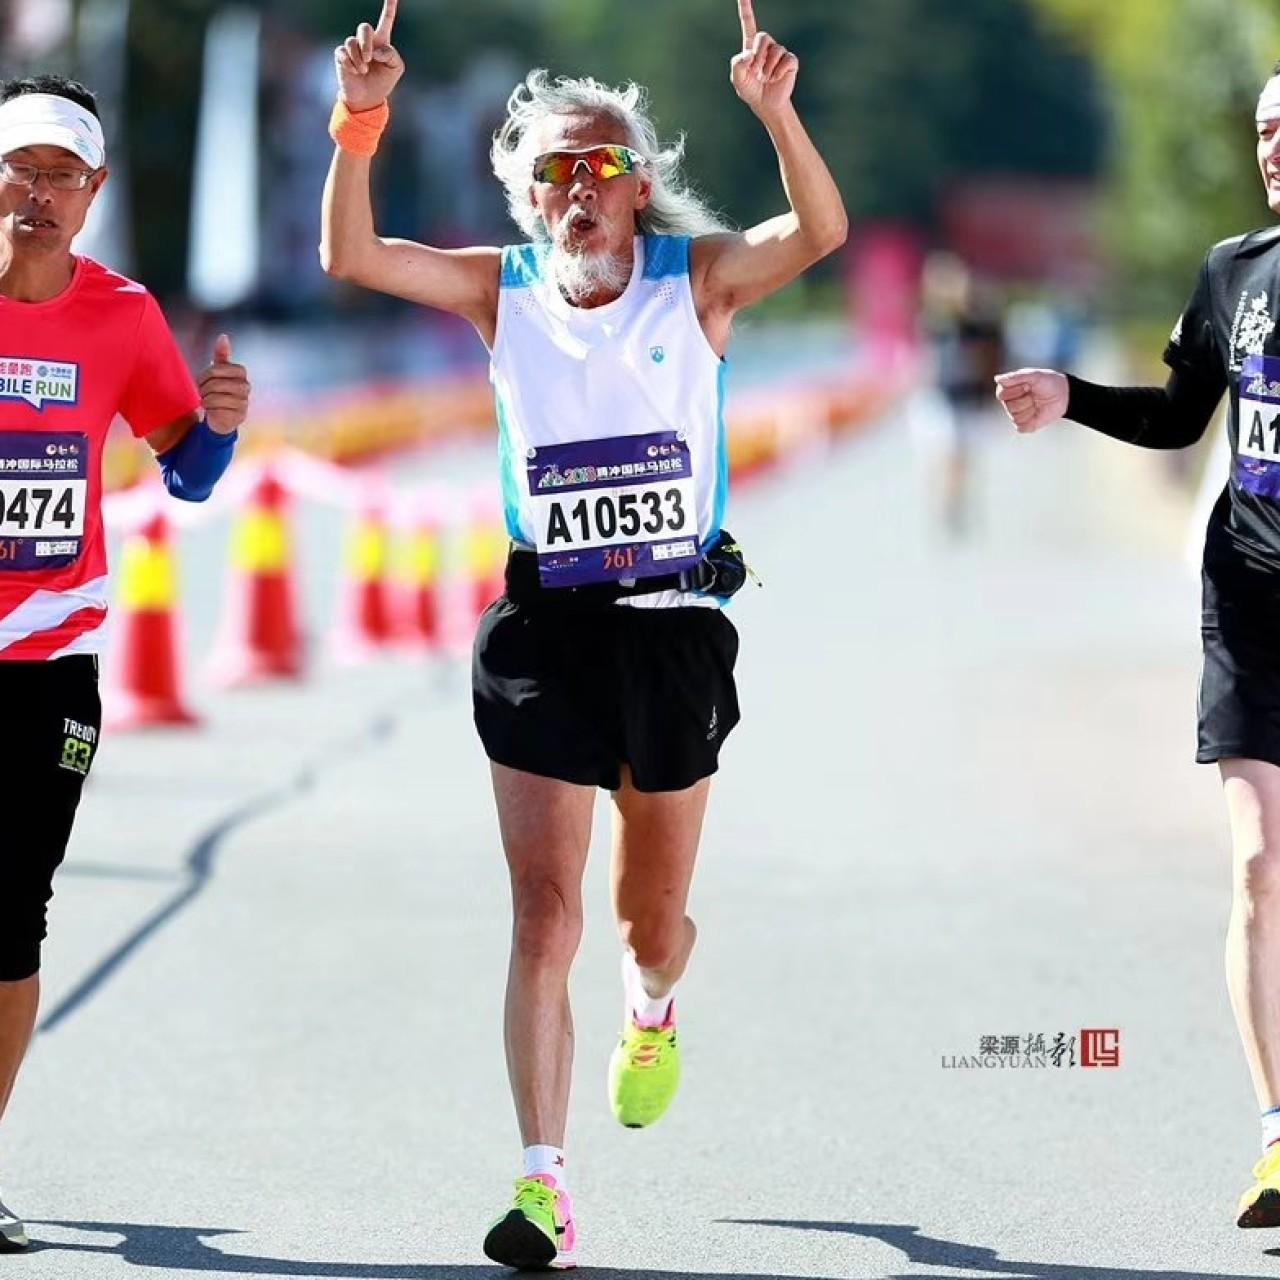 He took up running aged 70  He's run a sub-4-hour marathon